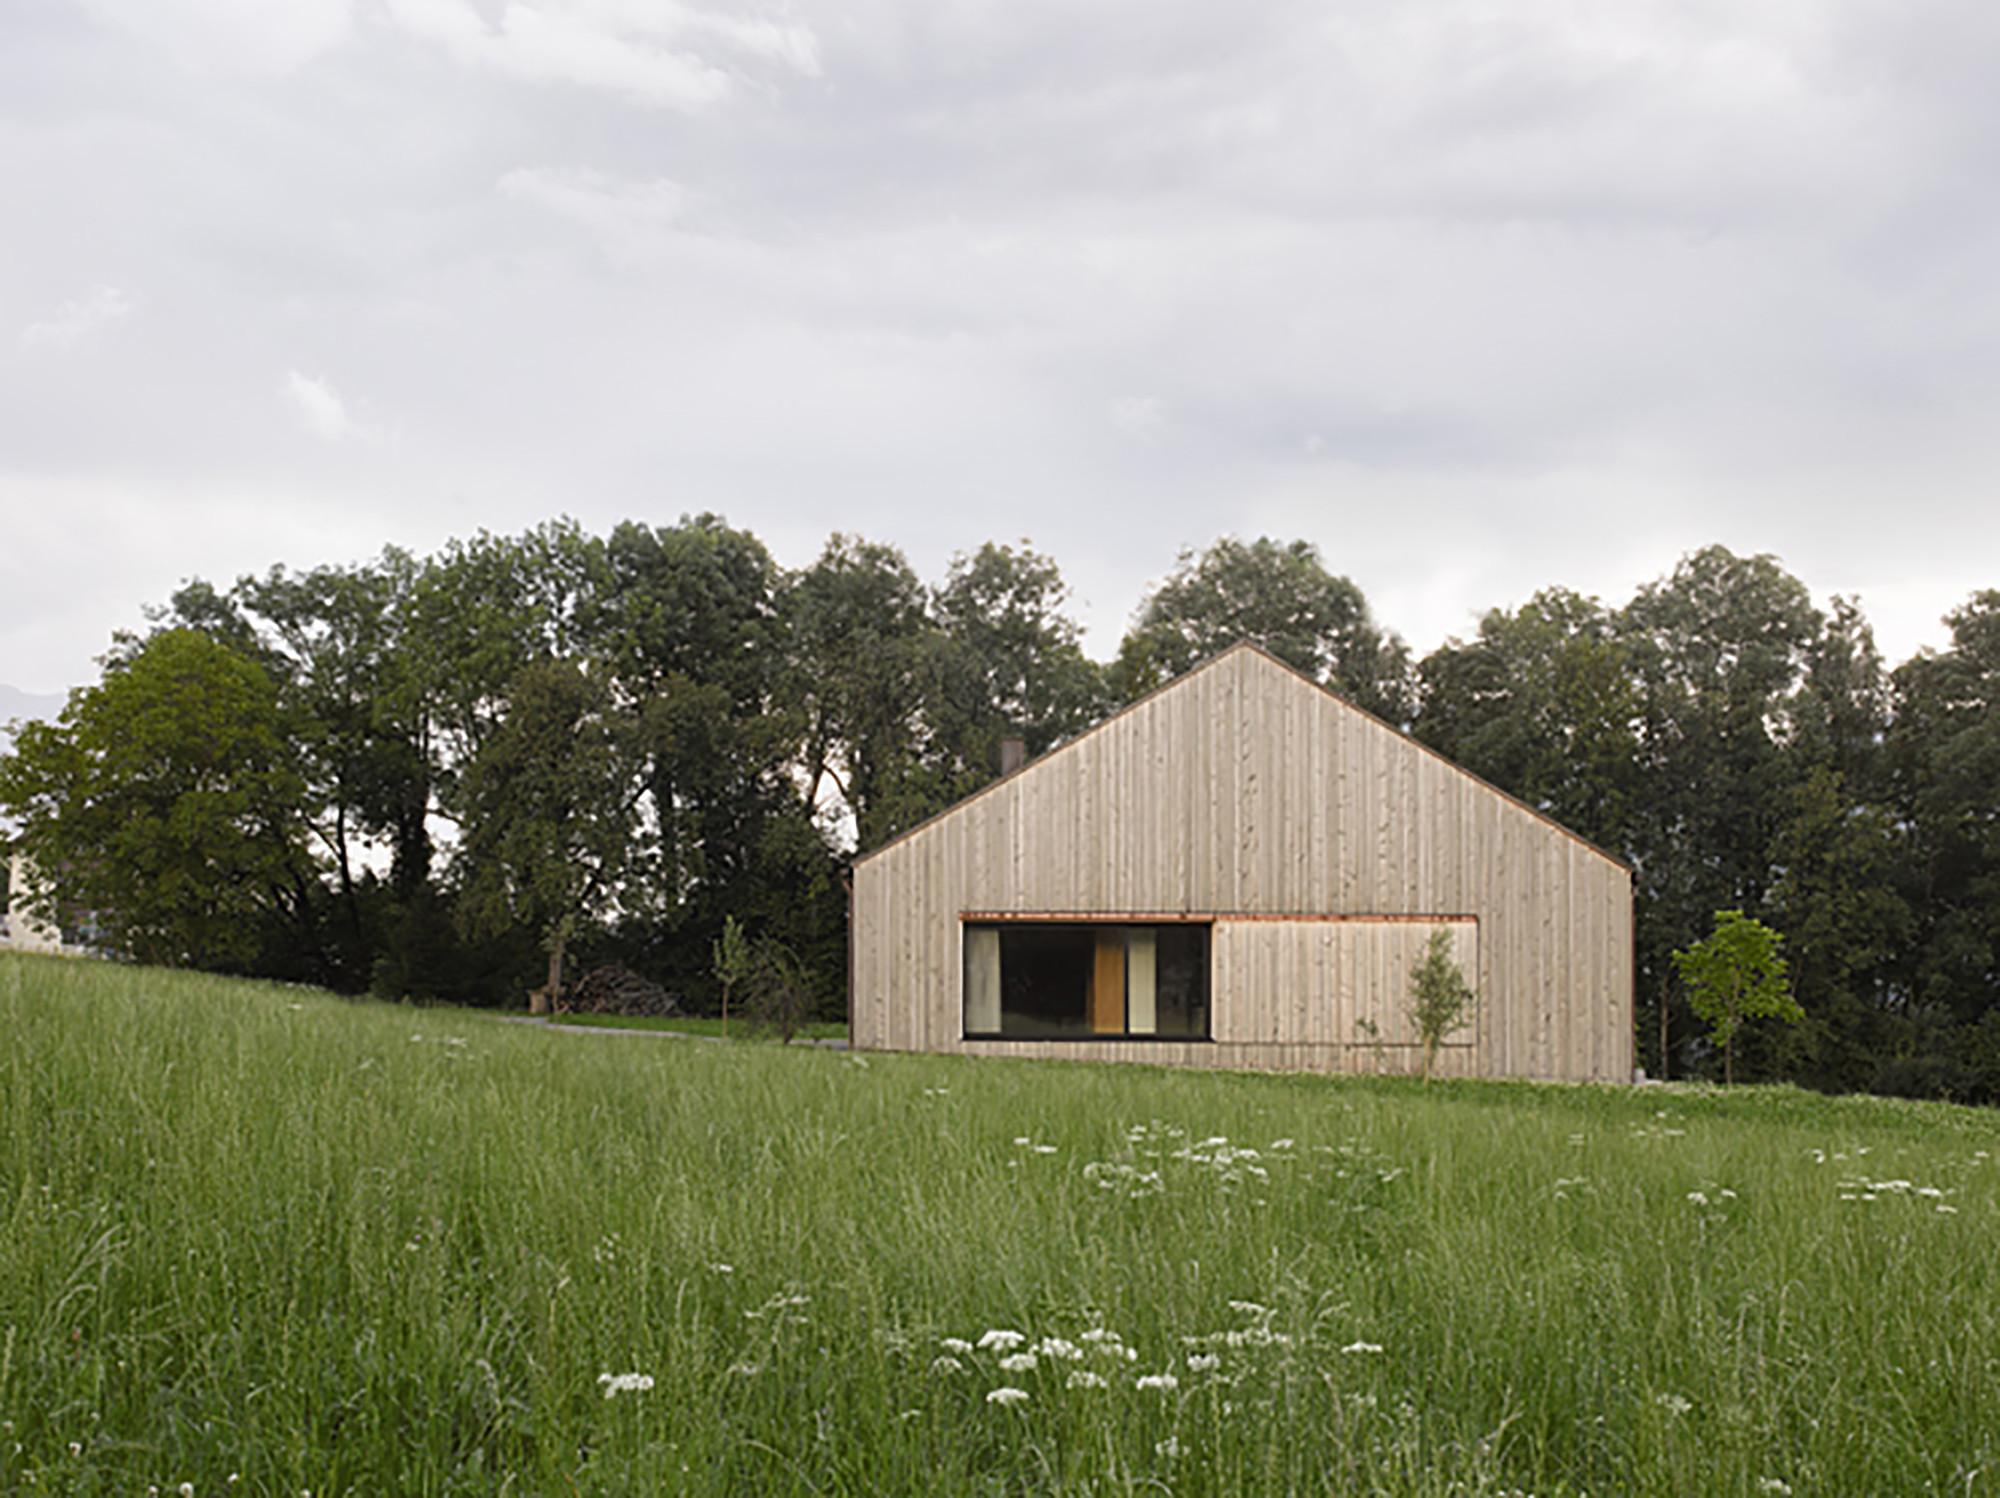 Casa Kaltschmieden / Bernardo Bader Architects, © Adolf Bereuter